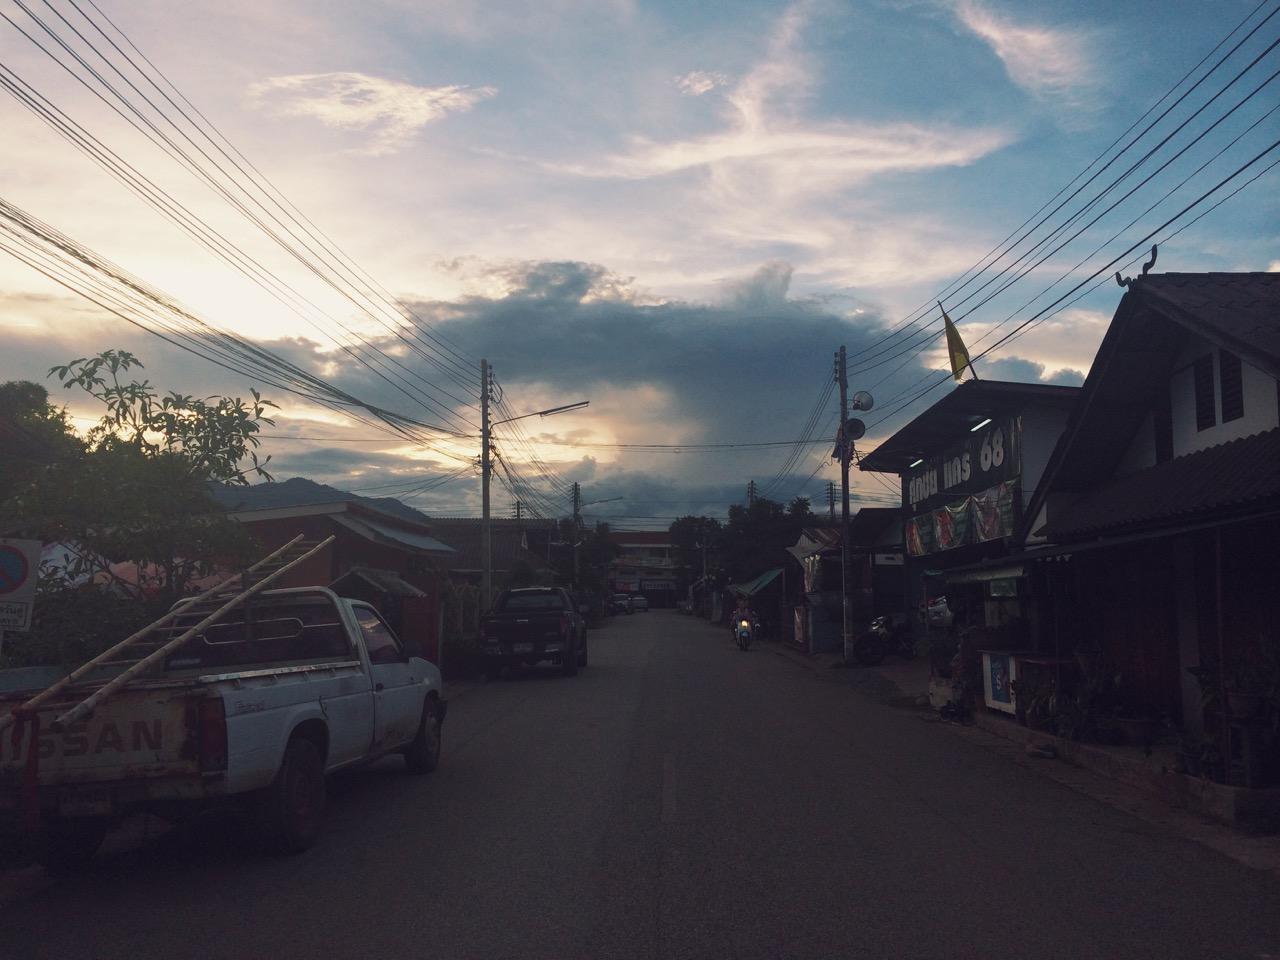 Путешествие по Таиланду, Пай: Улица Пая на закате